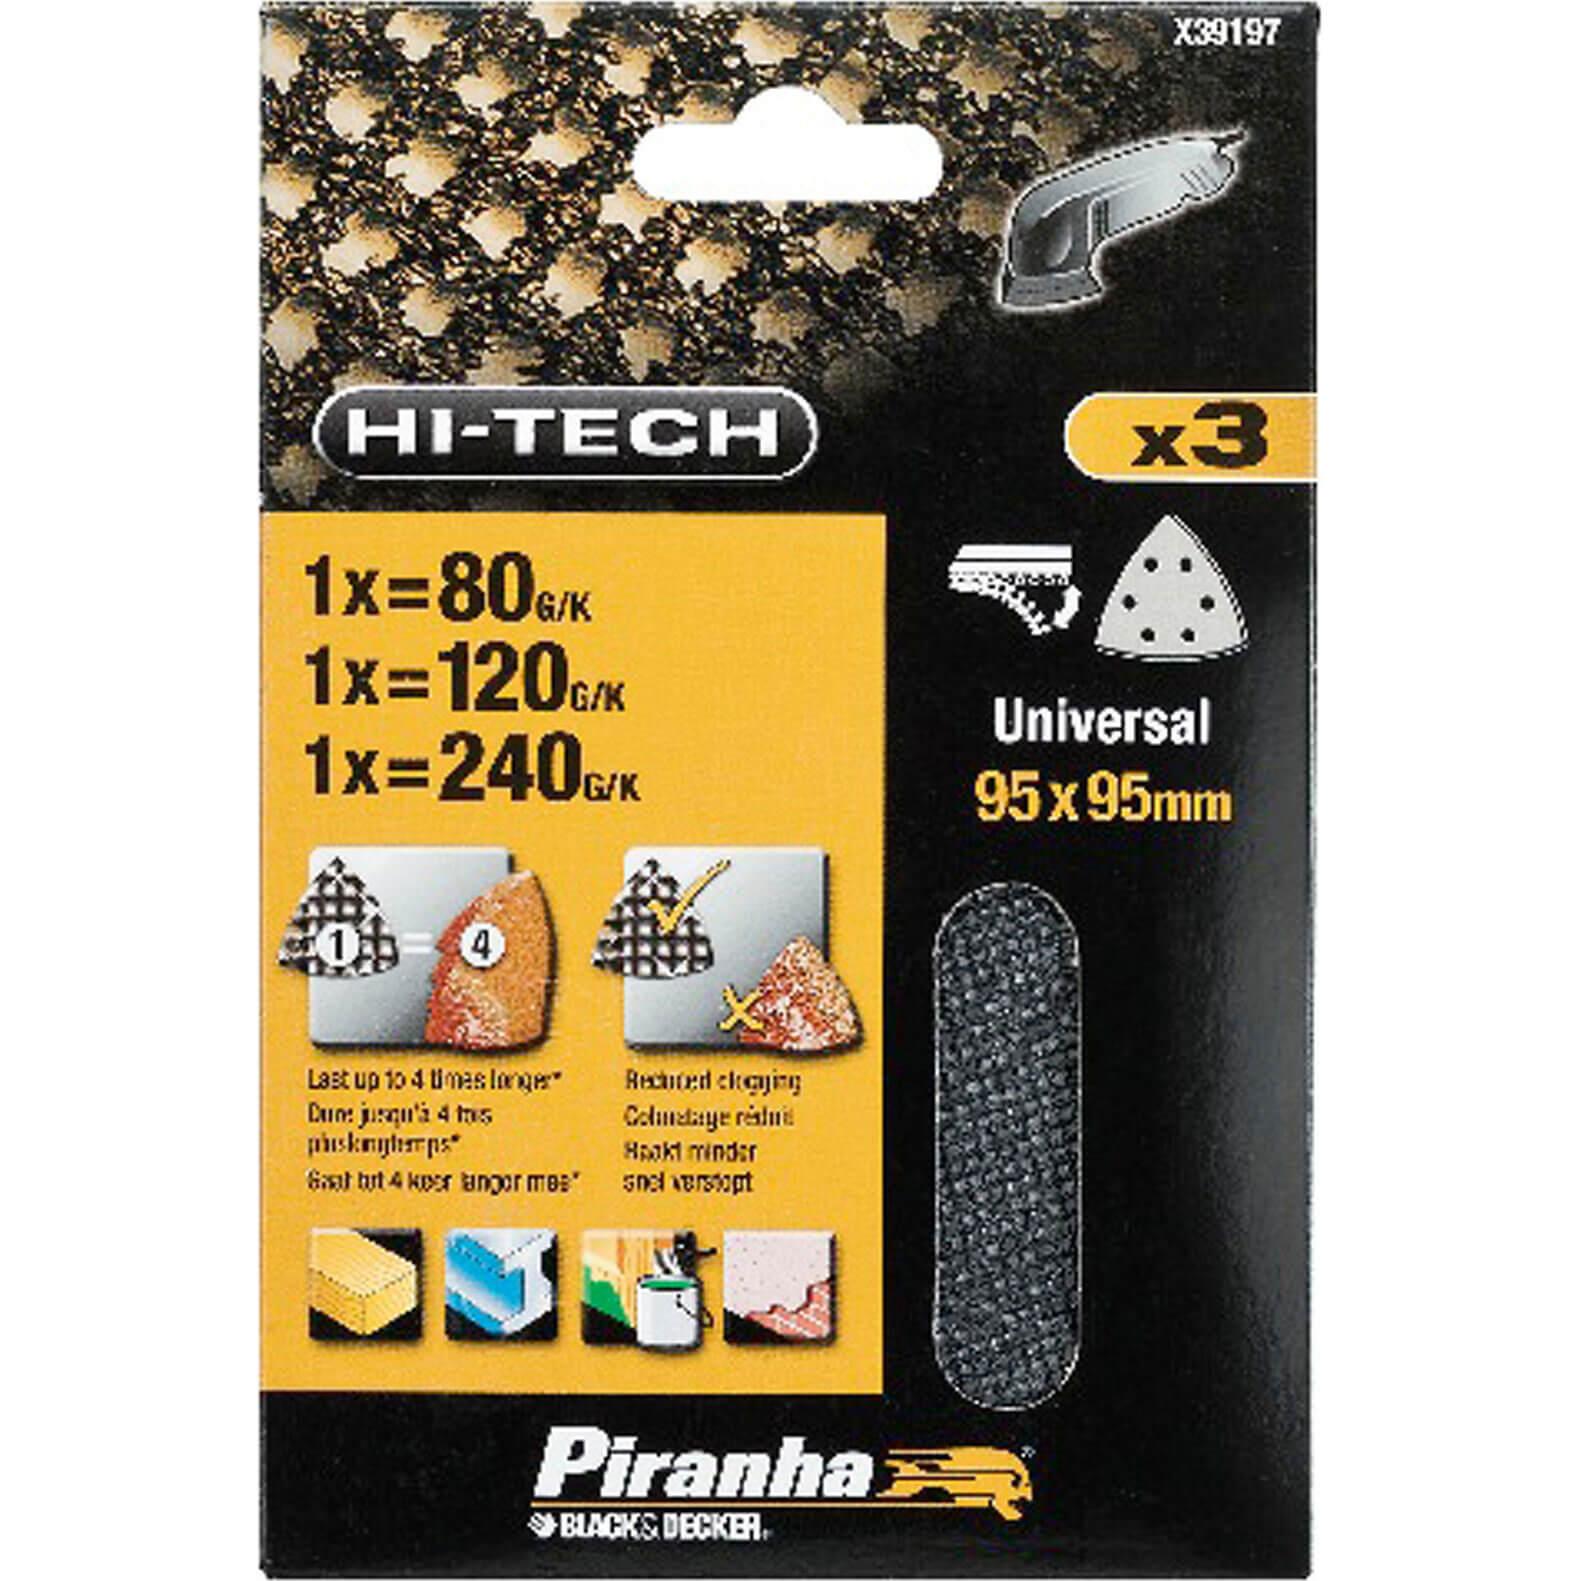 Image of Black & Decker Piranha Hi Tech Quick Fit Mesh Delta Sanding Sheets 95mm x 95mm 120g Pack of 3